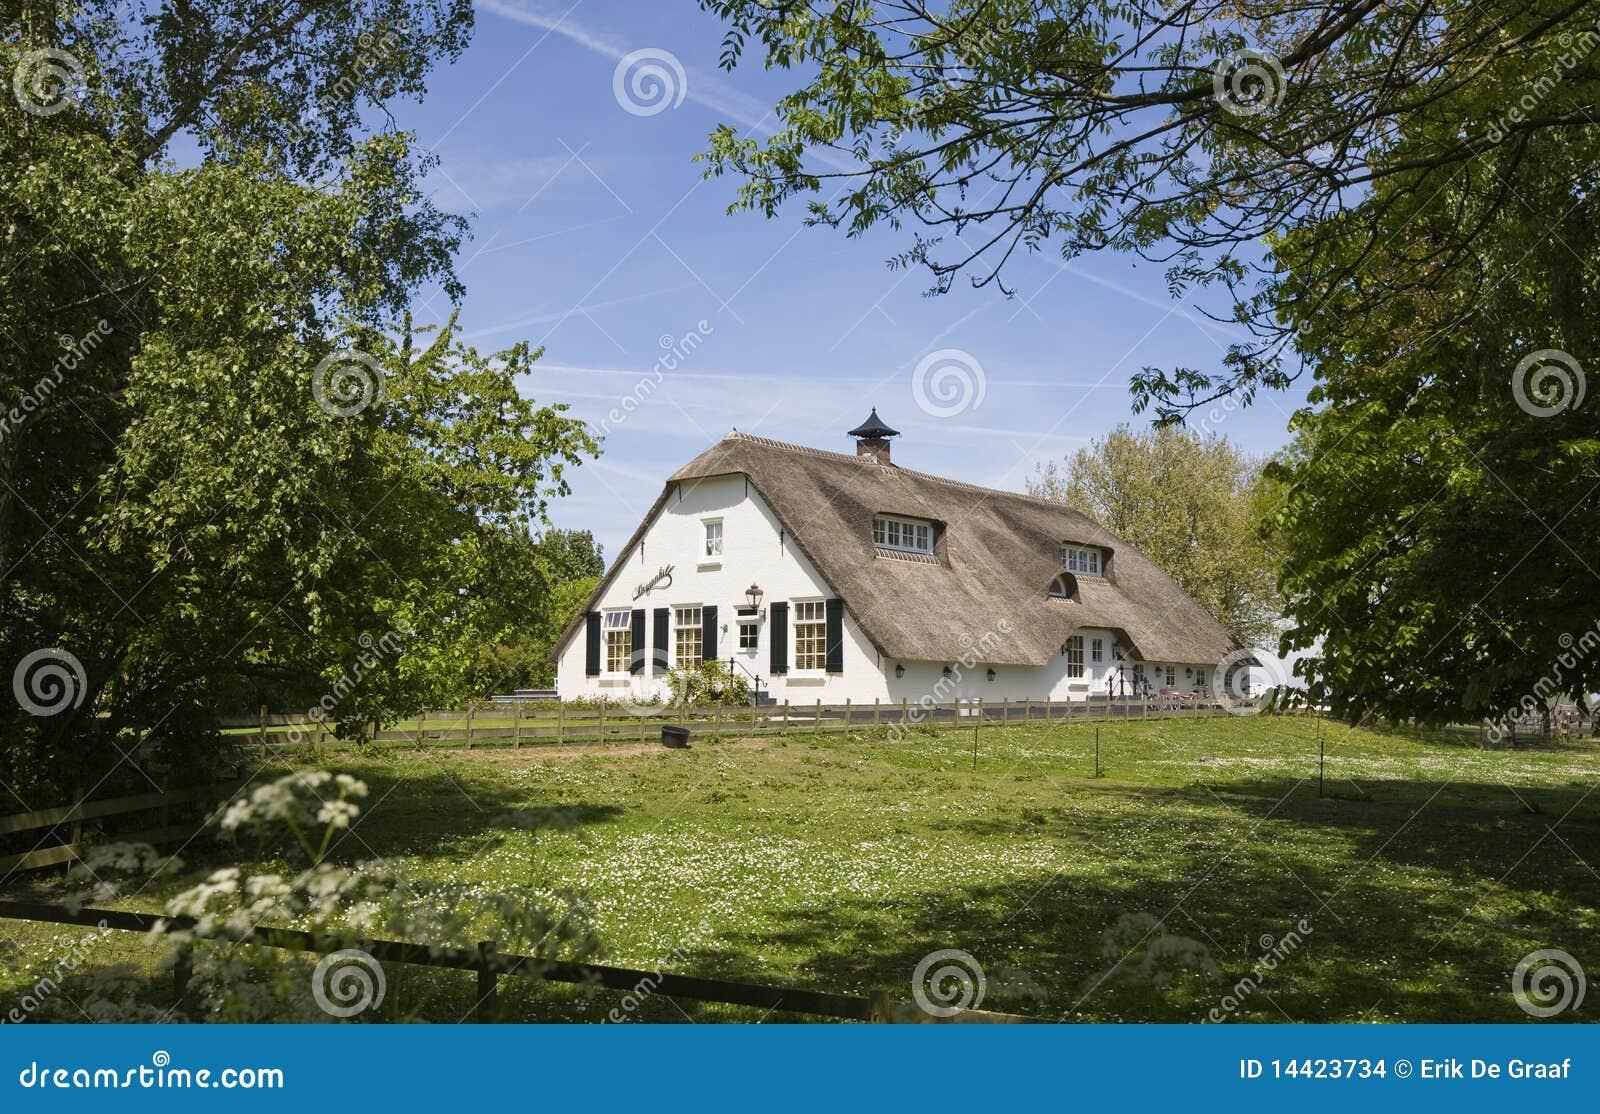 Dutch farm house stock images image 14423734 for Farm house netherlands